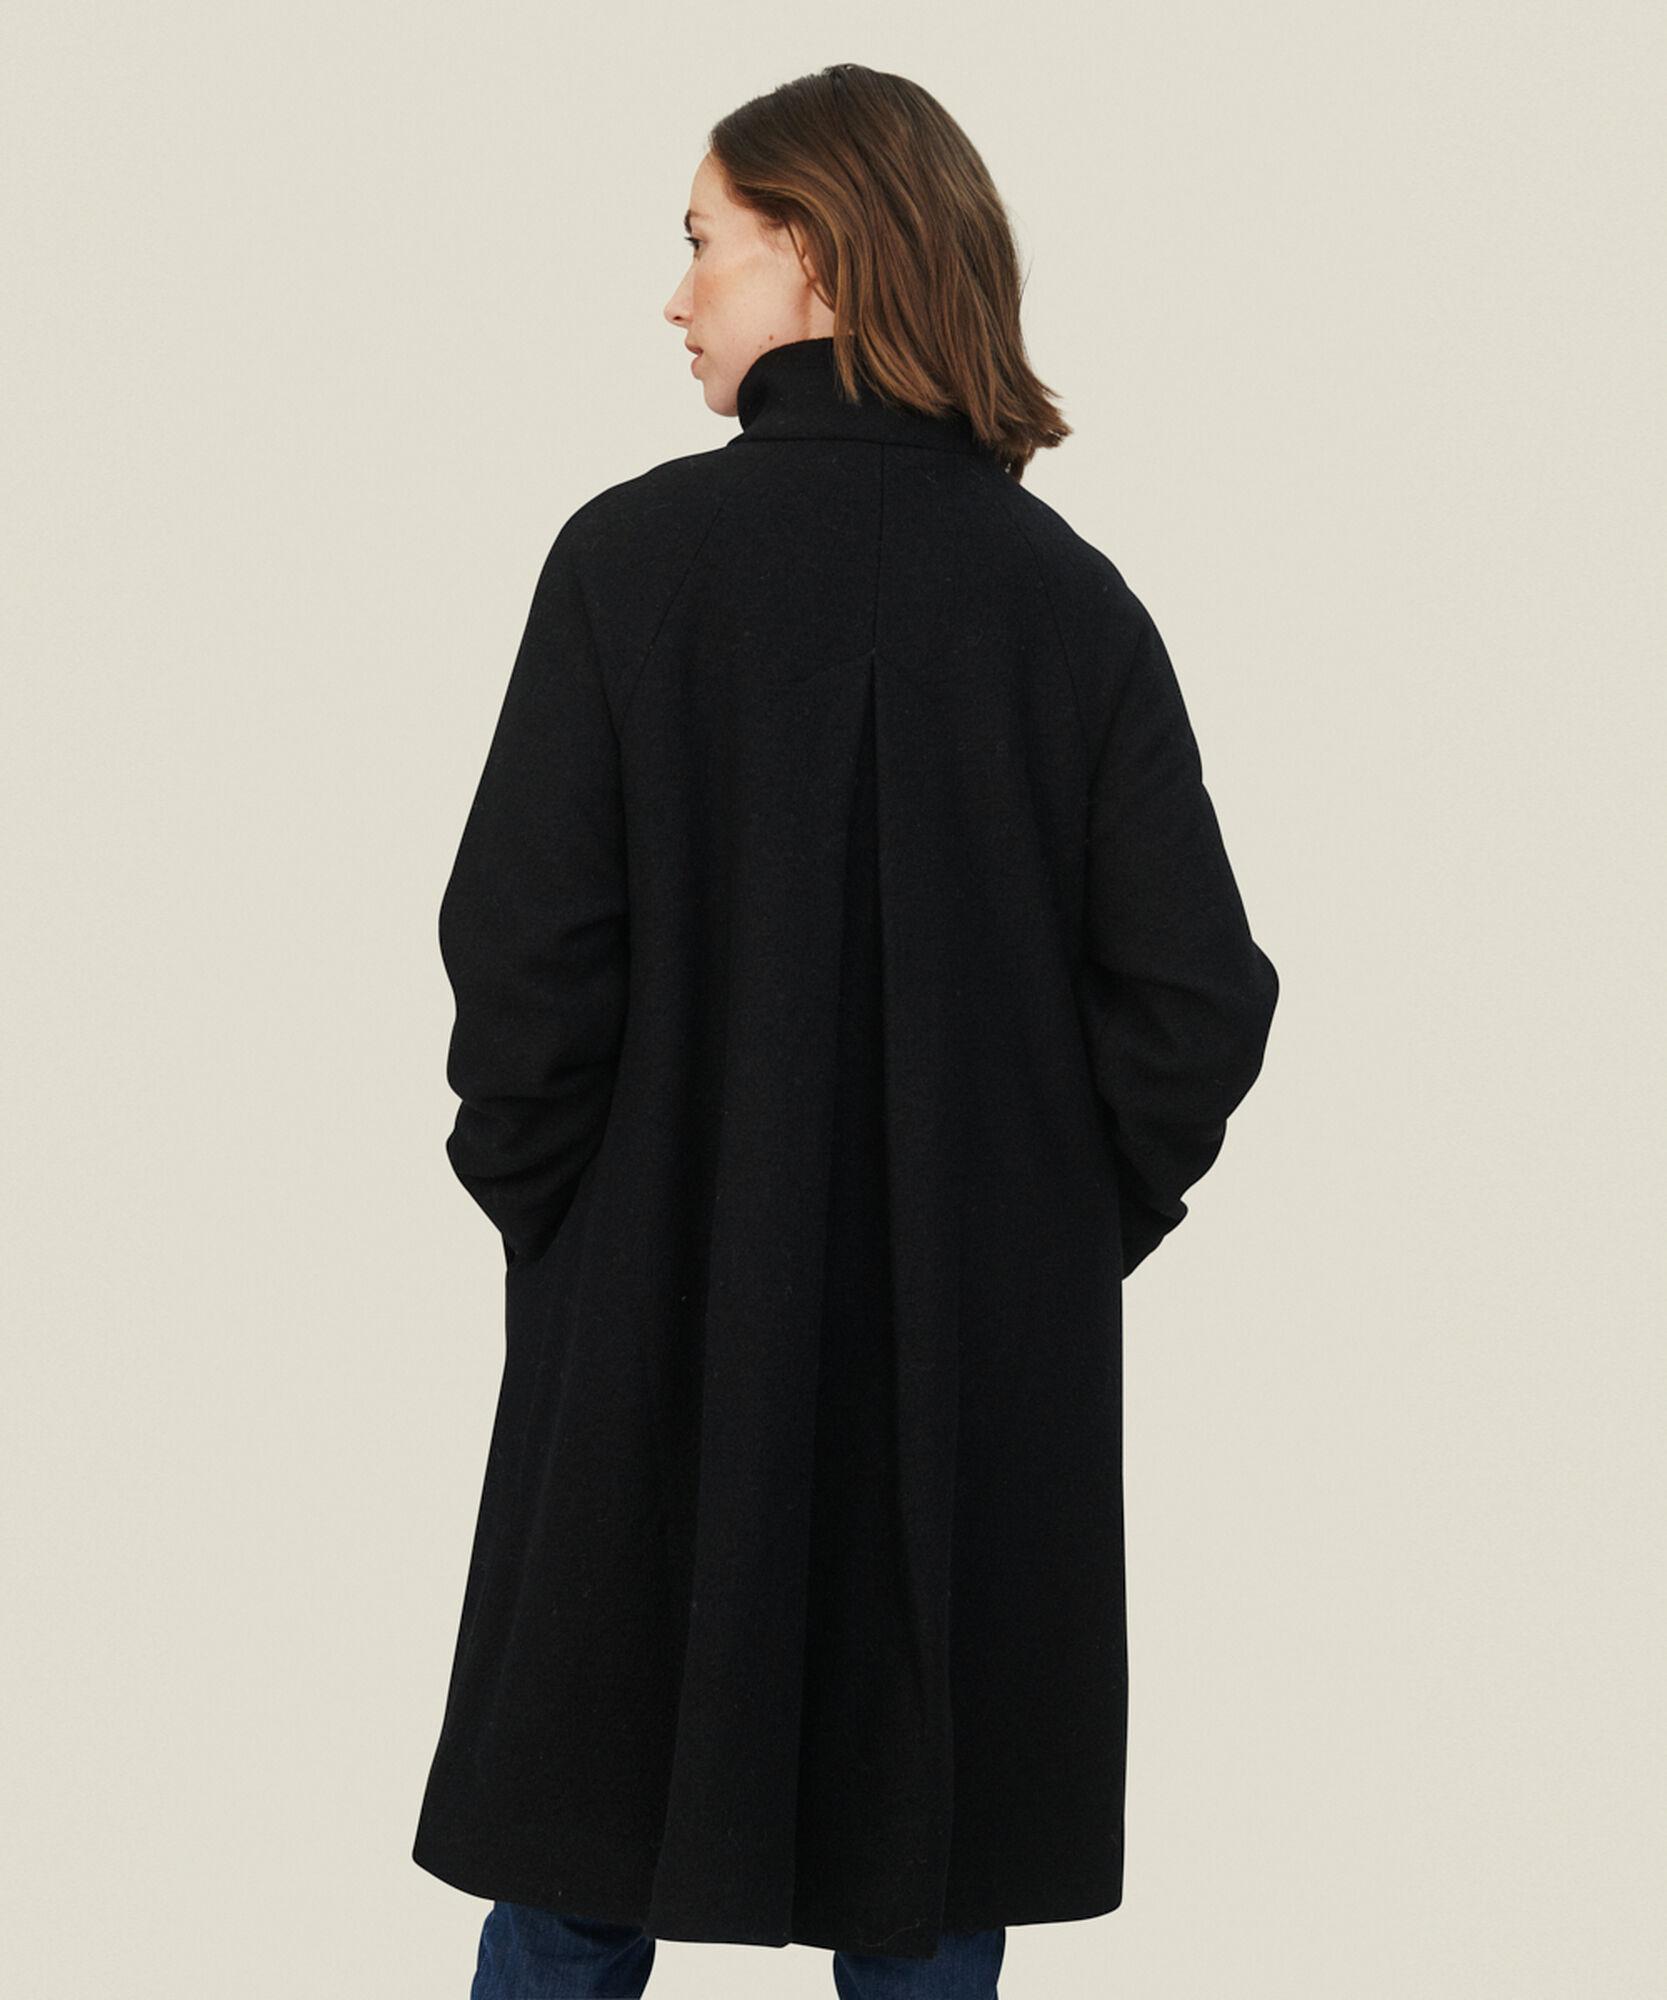 TESSA ULLKÅPE, Black, hi-res